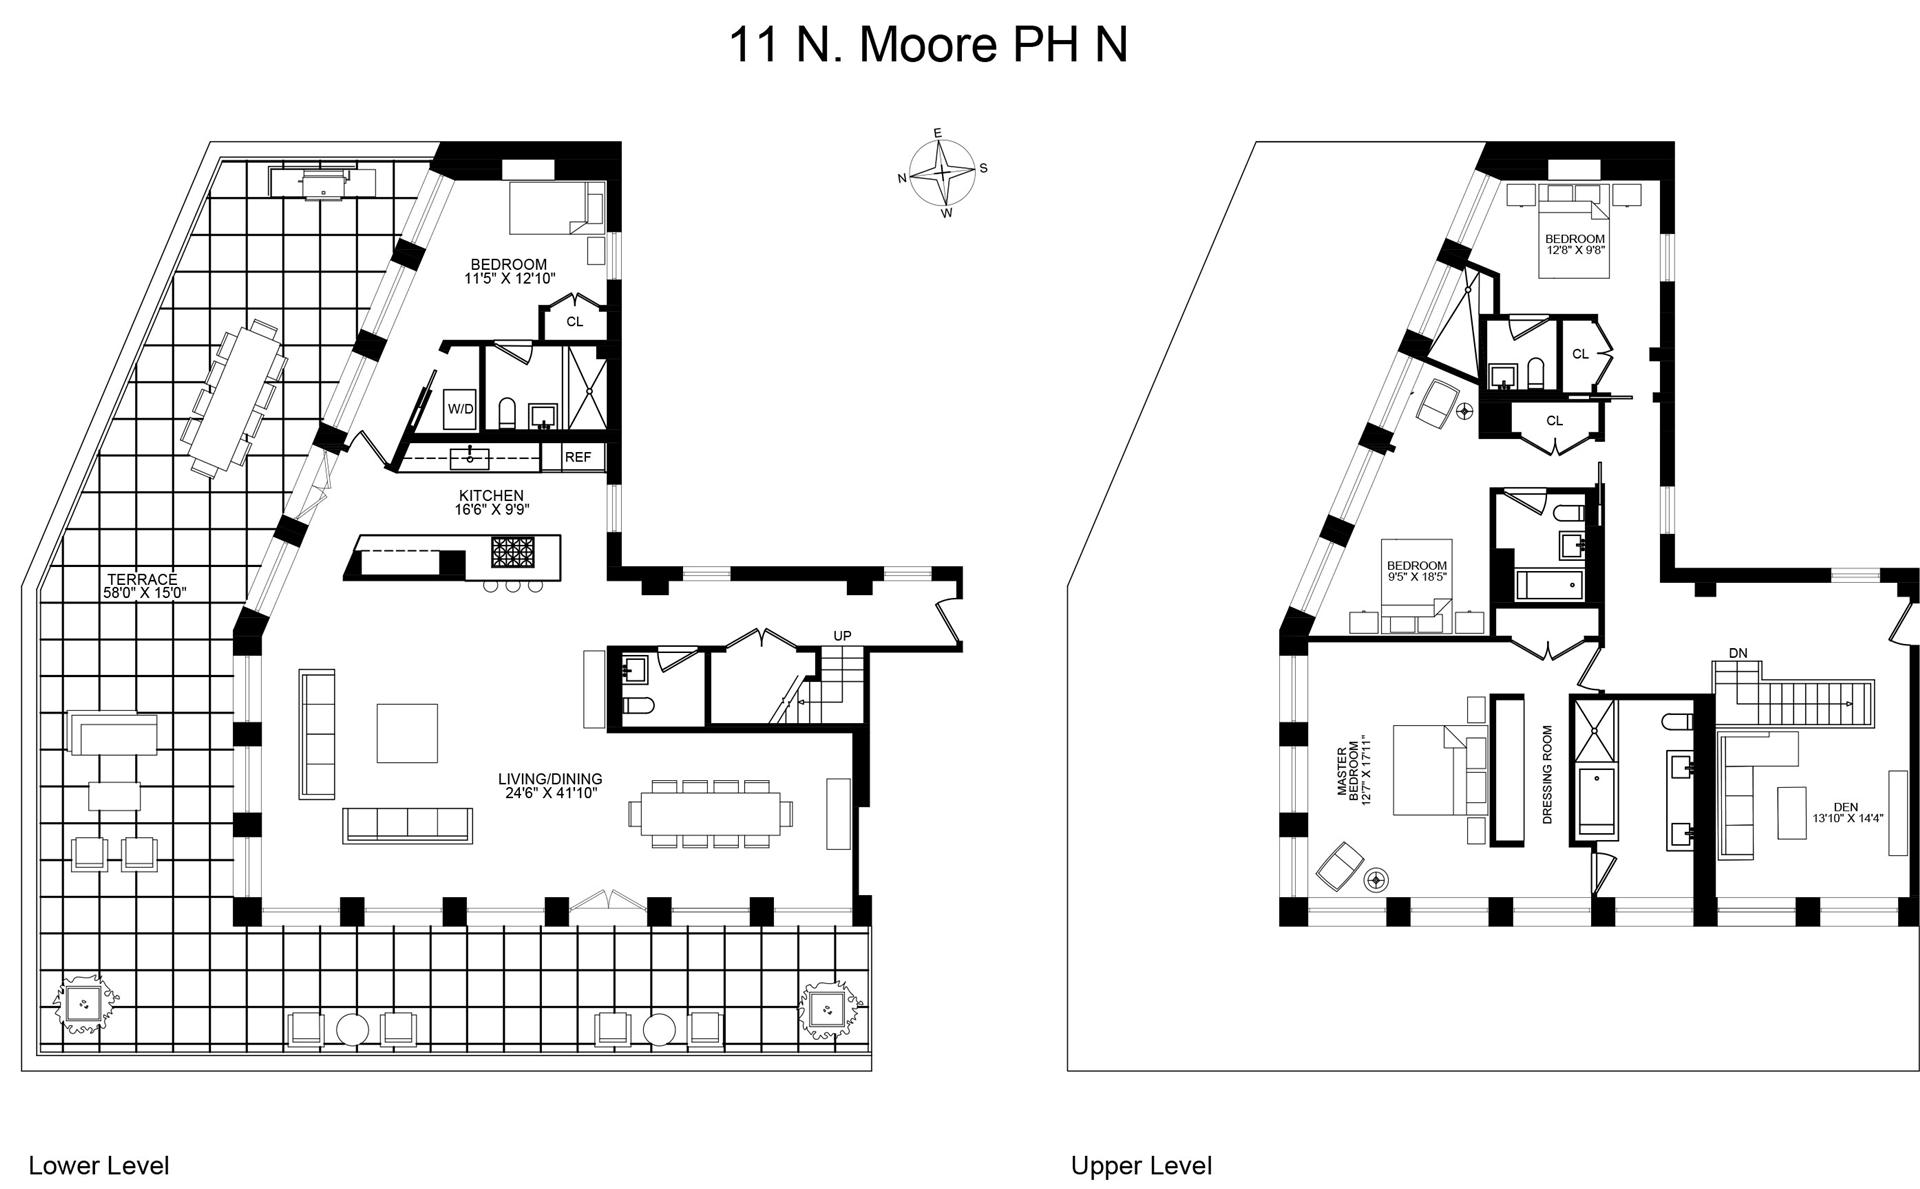 Floor plan of 11 North Moore St, PHN - TriBeCa, New York